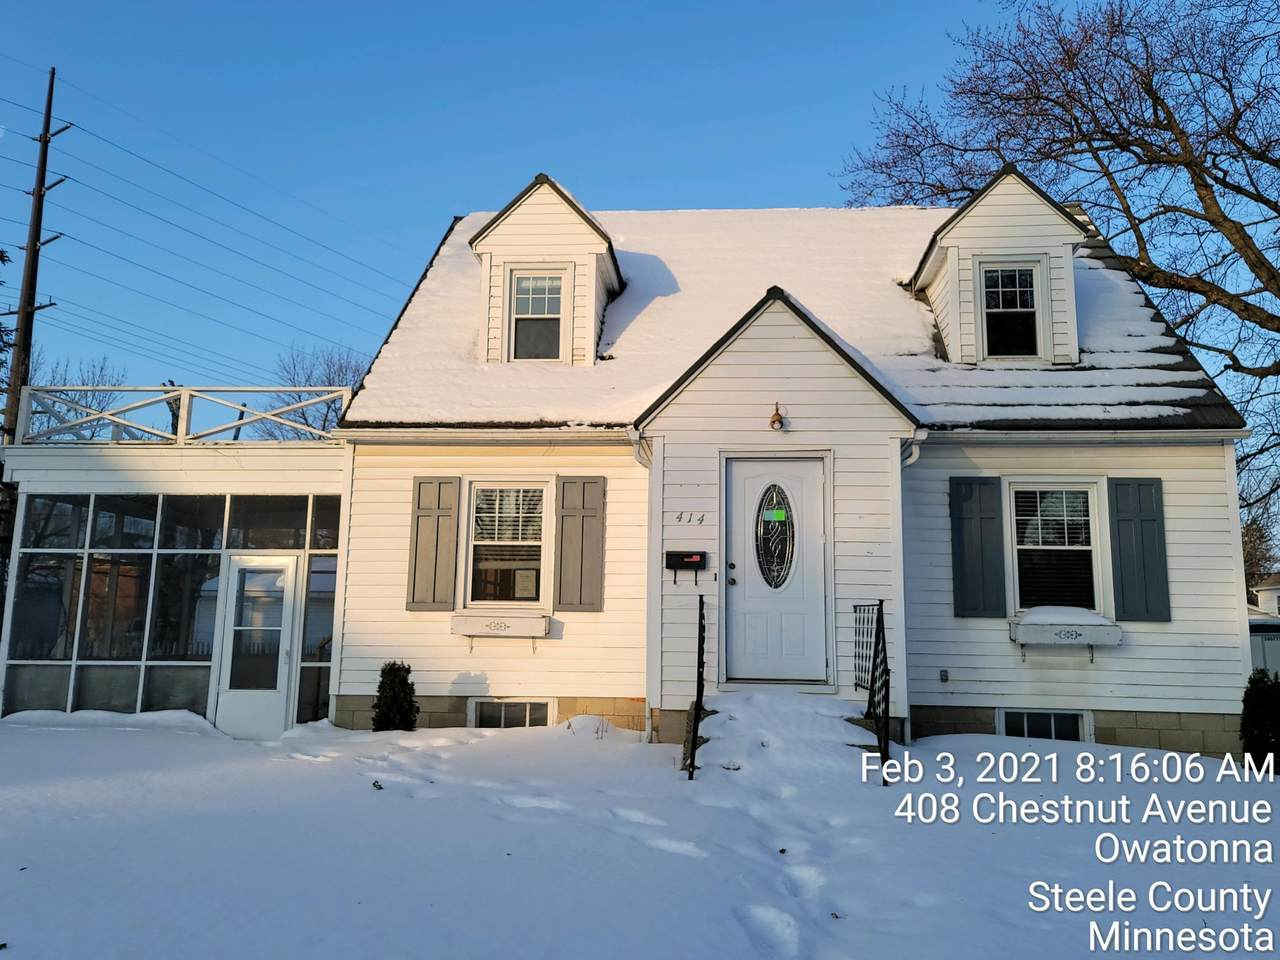 414 Chestnut Avenue - Photo 1